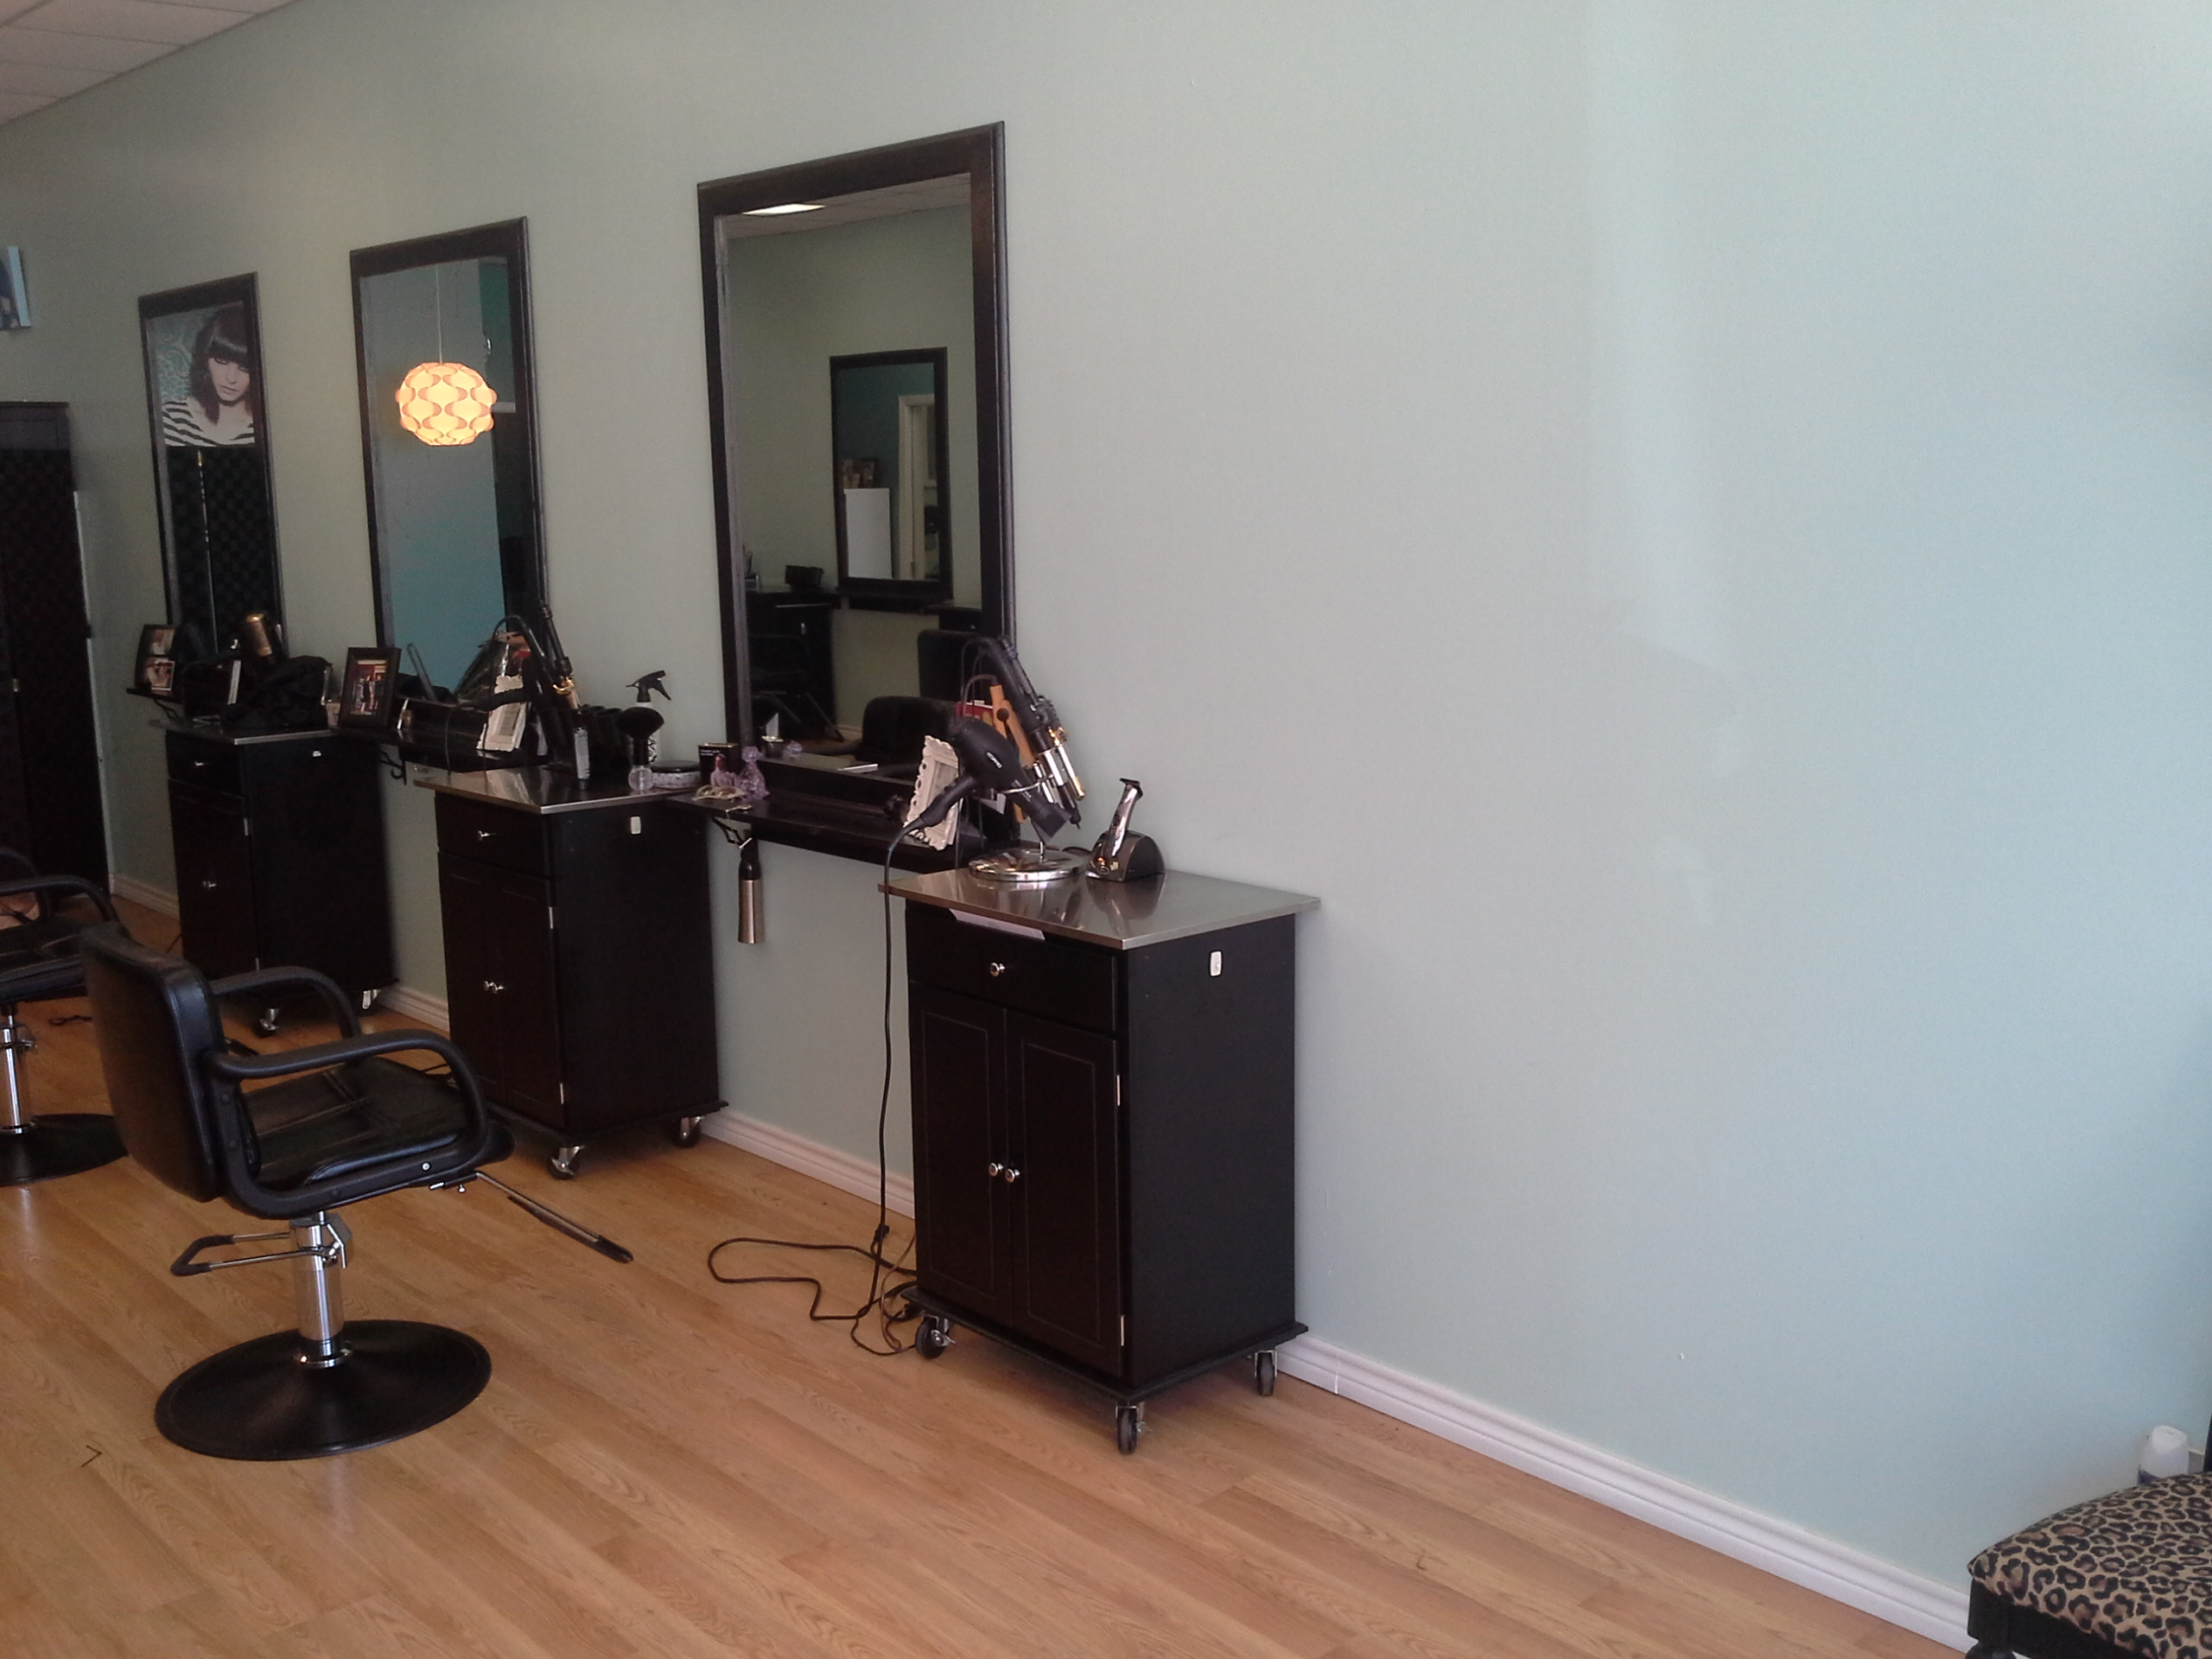 Bettie Bangs Salon image 38